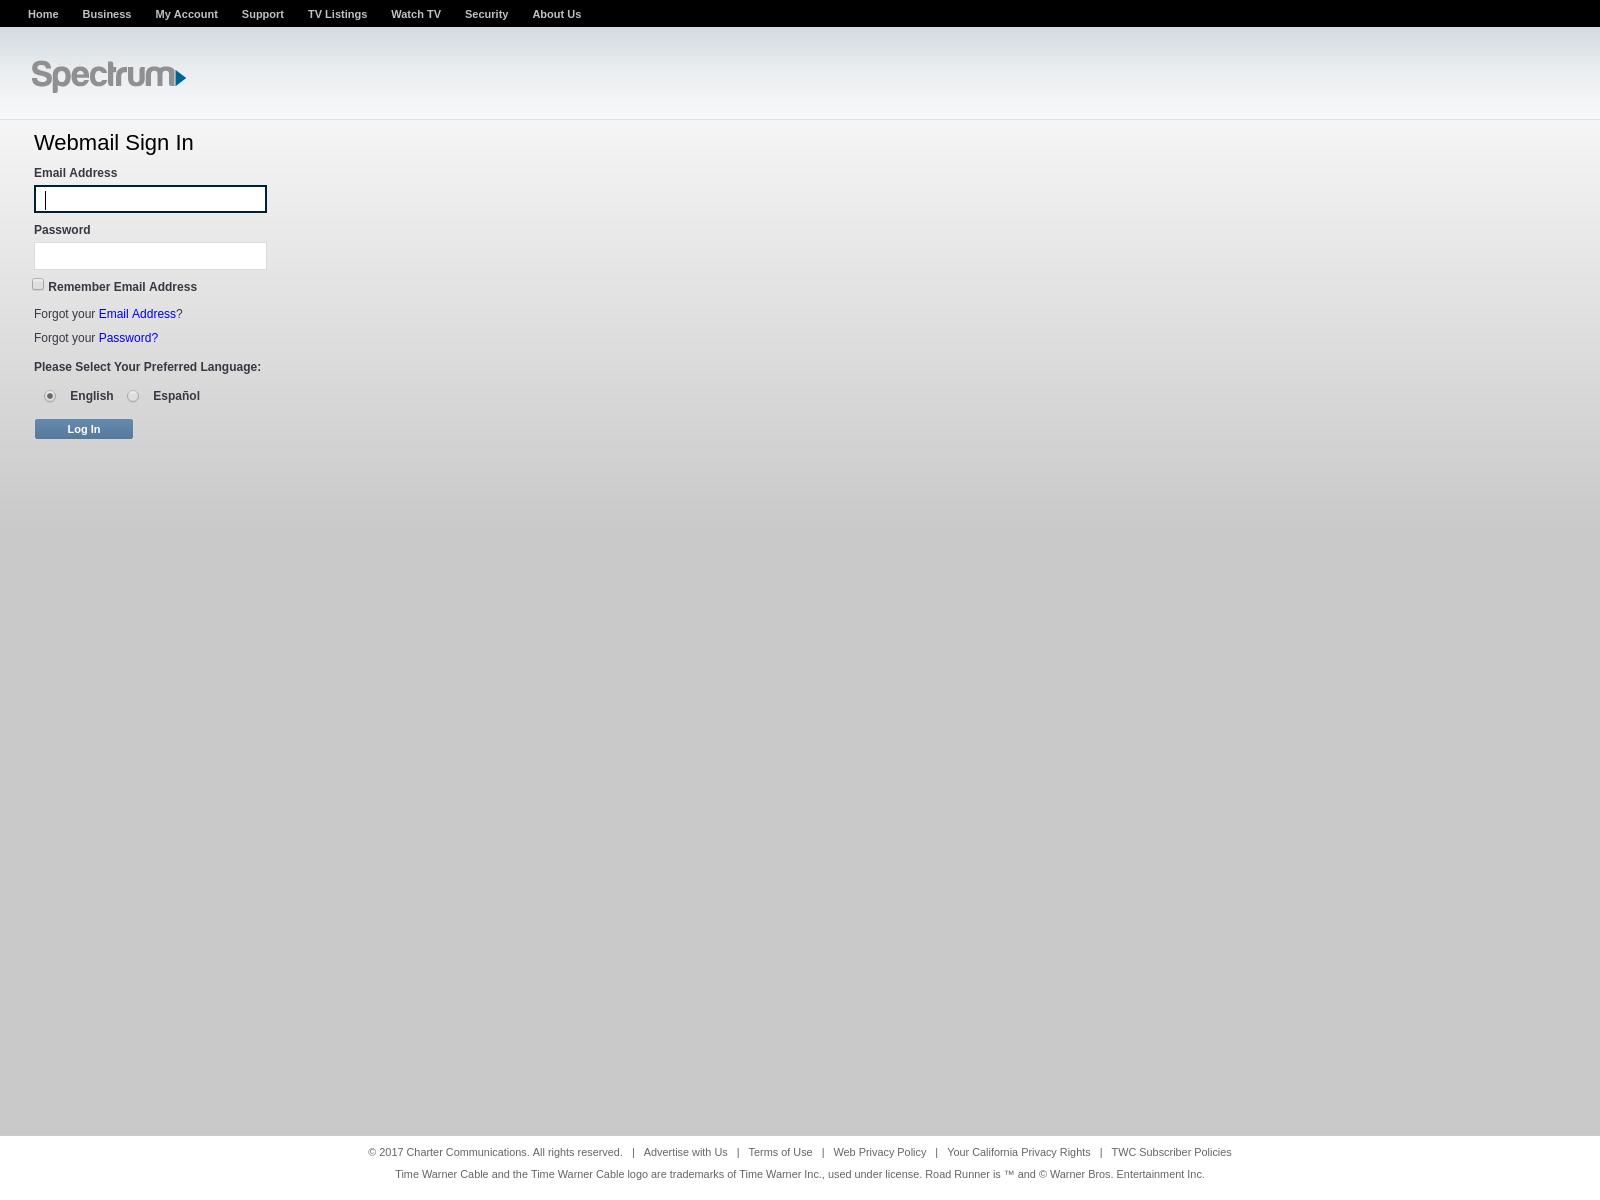 I Forgot My Time Warner Cable Email Address: webmail.tampabay.rr.com - urlscan.iorh:urlscan.io,Design